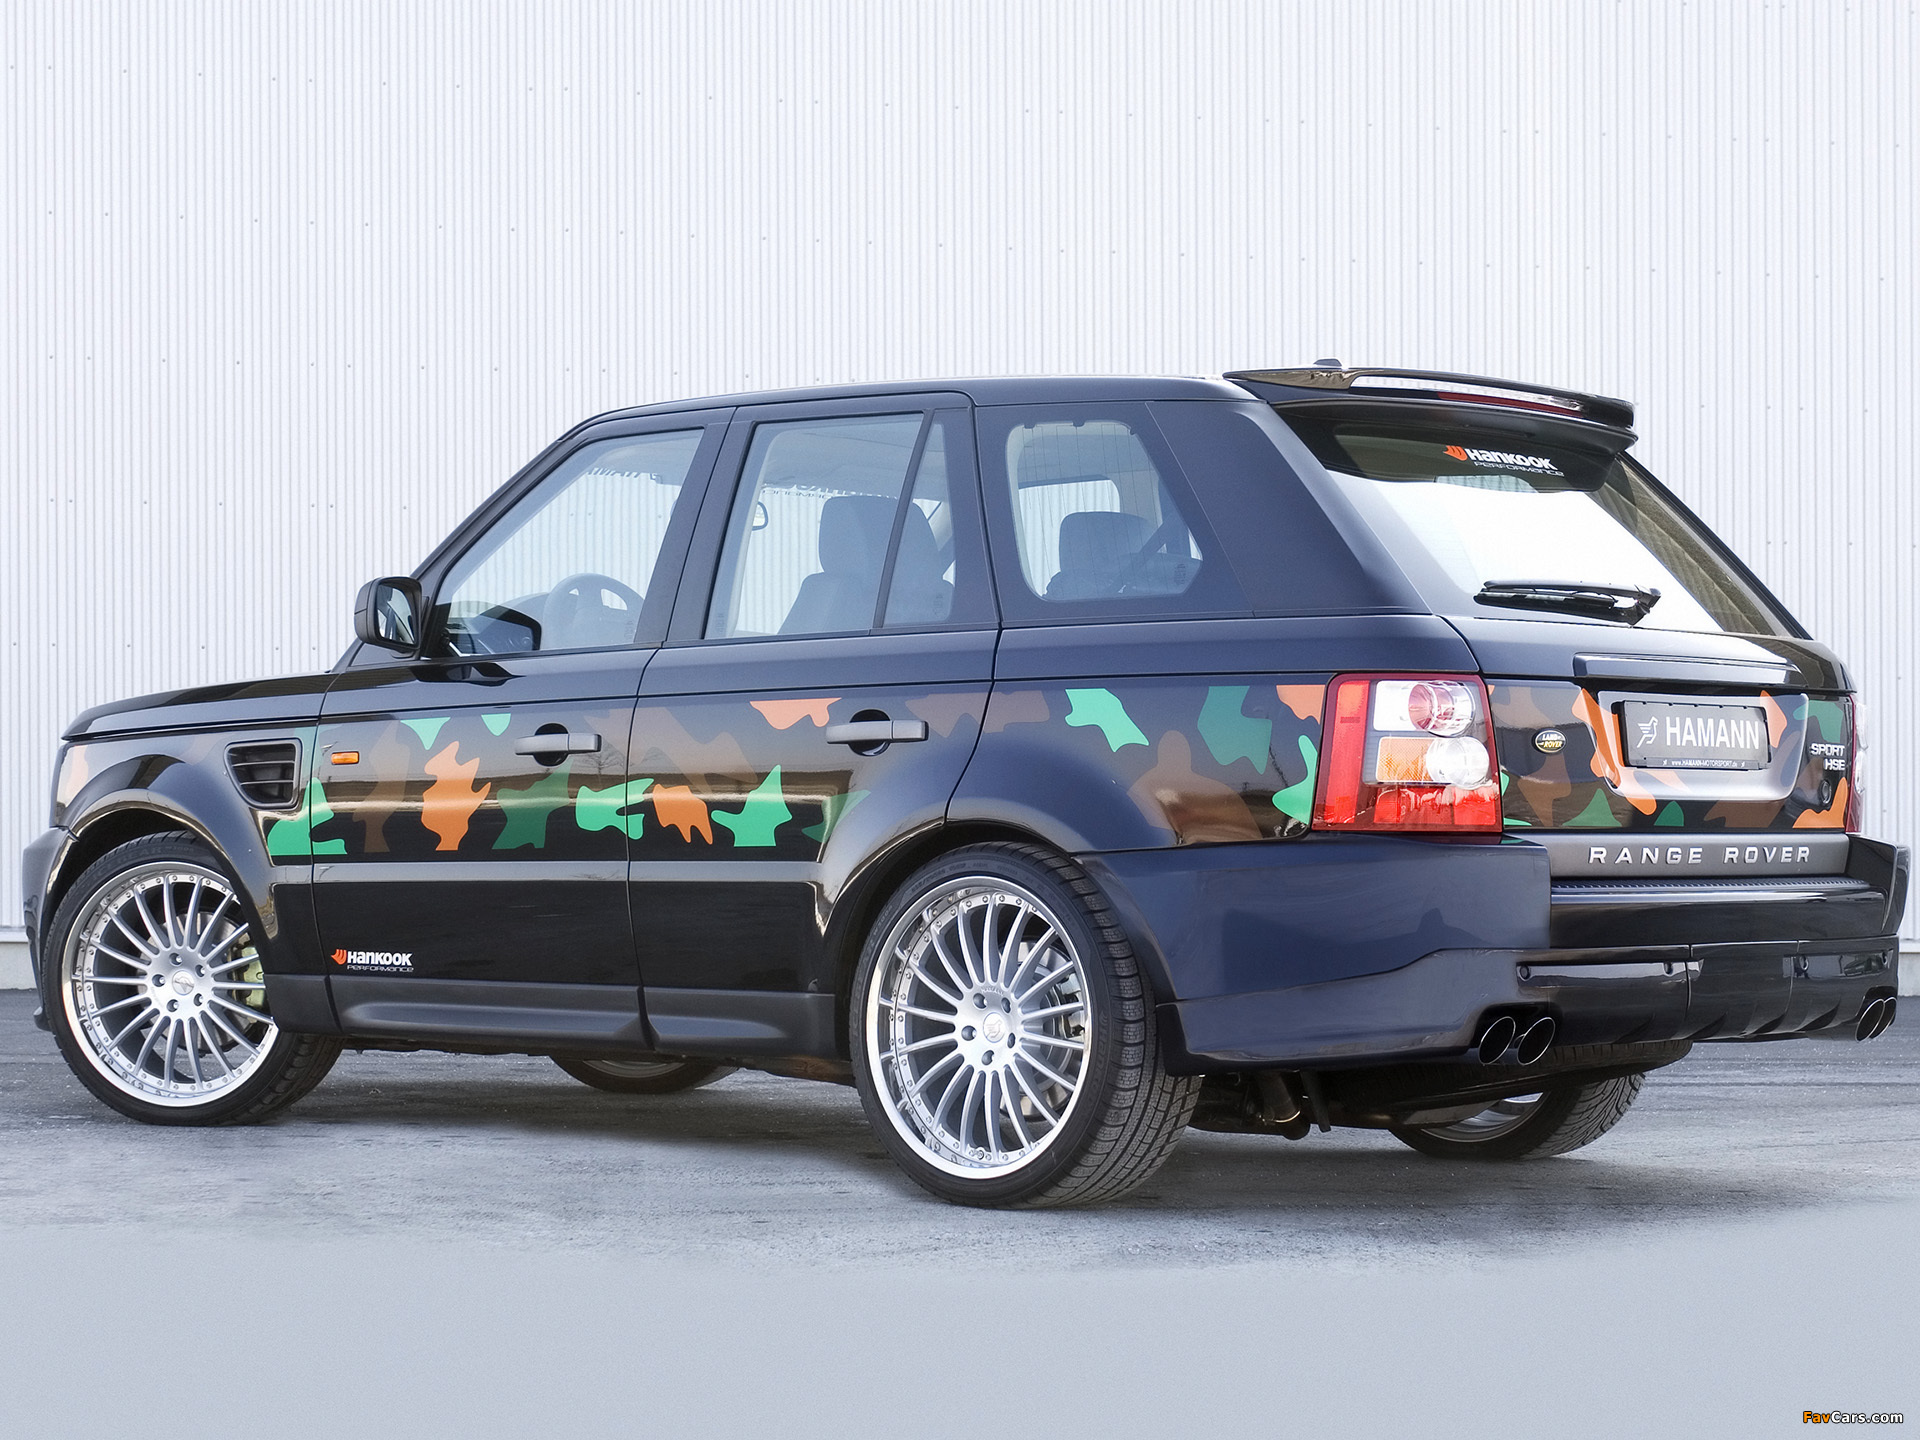 Hamann Range Rover Sport 2006 pictures (1920 x 1440)